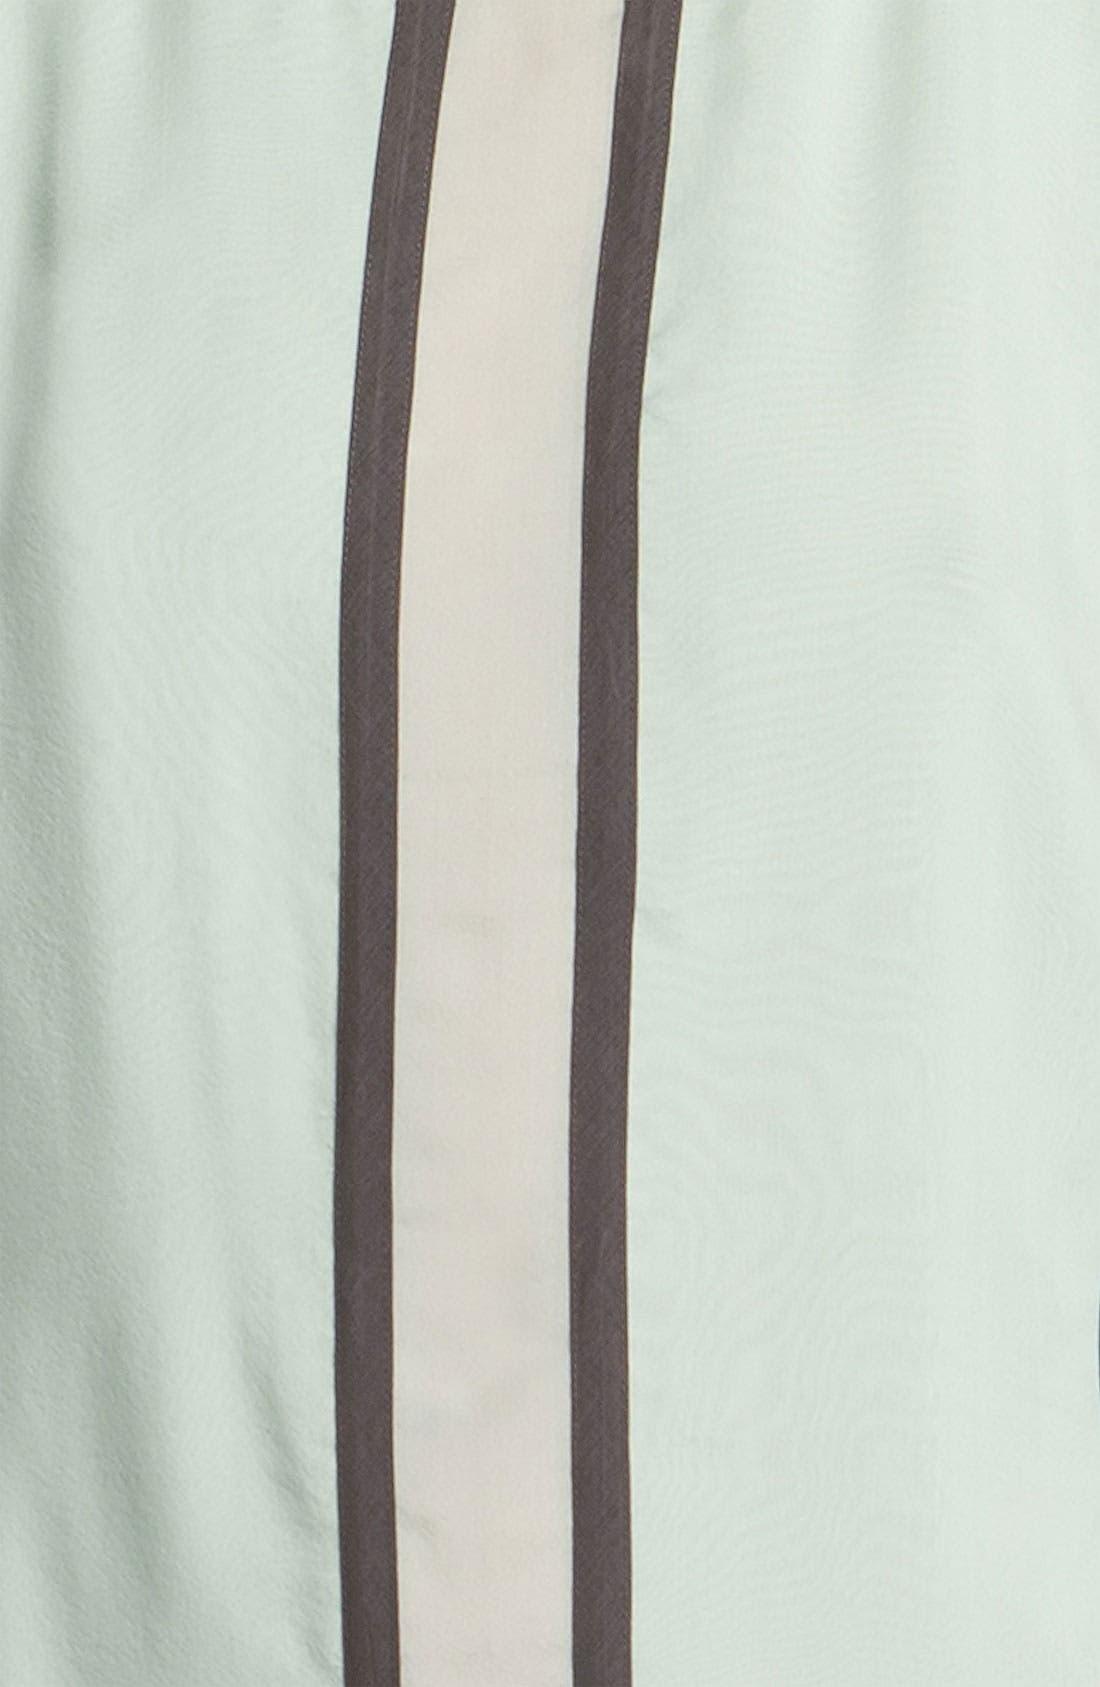 Alternate Image 3  - J Brand Ready-to-Wear 'Isabella' Chiffon Top